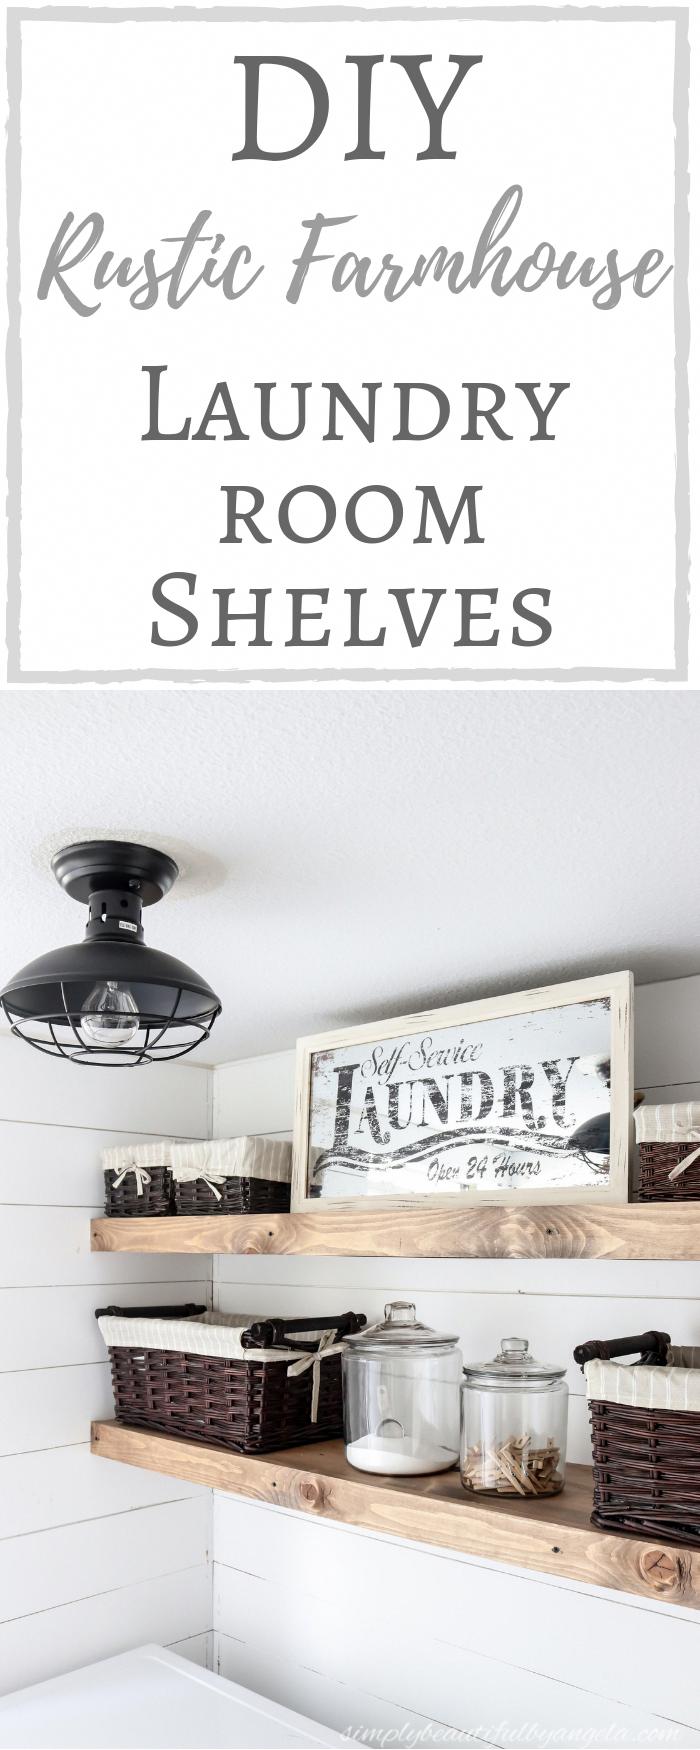 DIY Rustic Farmhouse Laundry Room Shelves